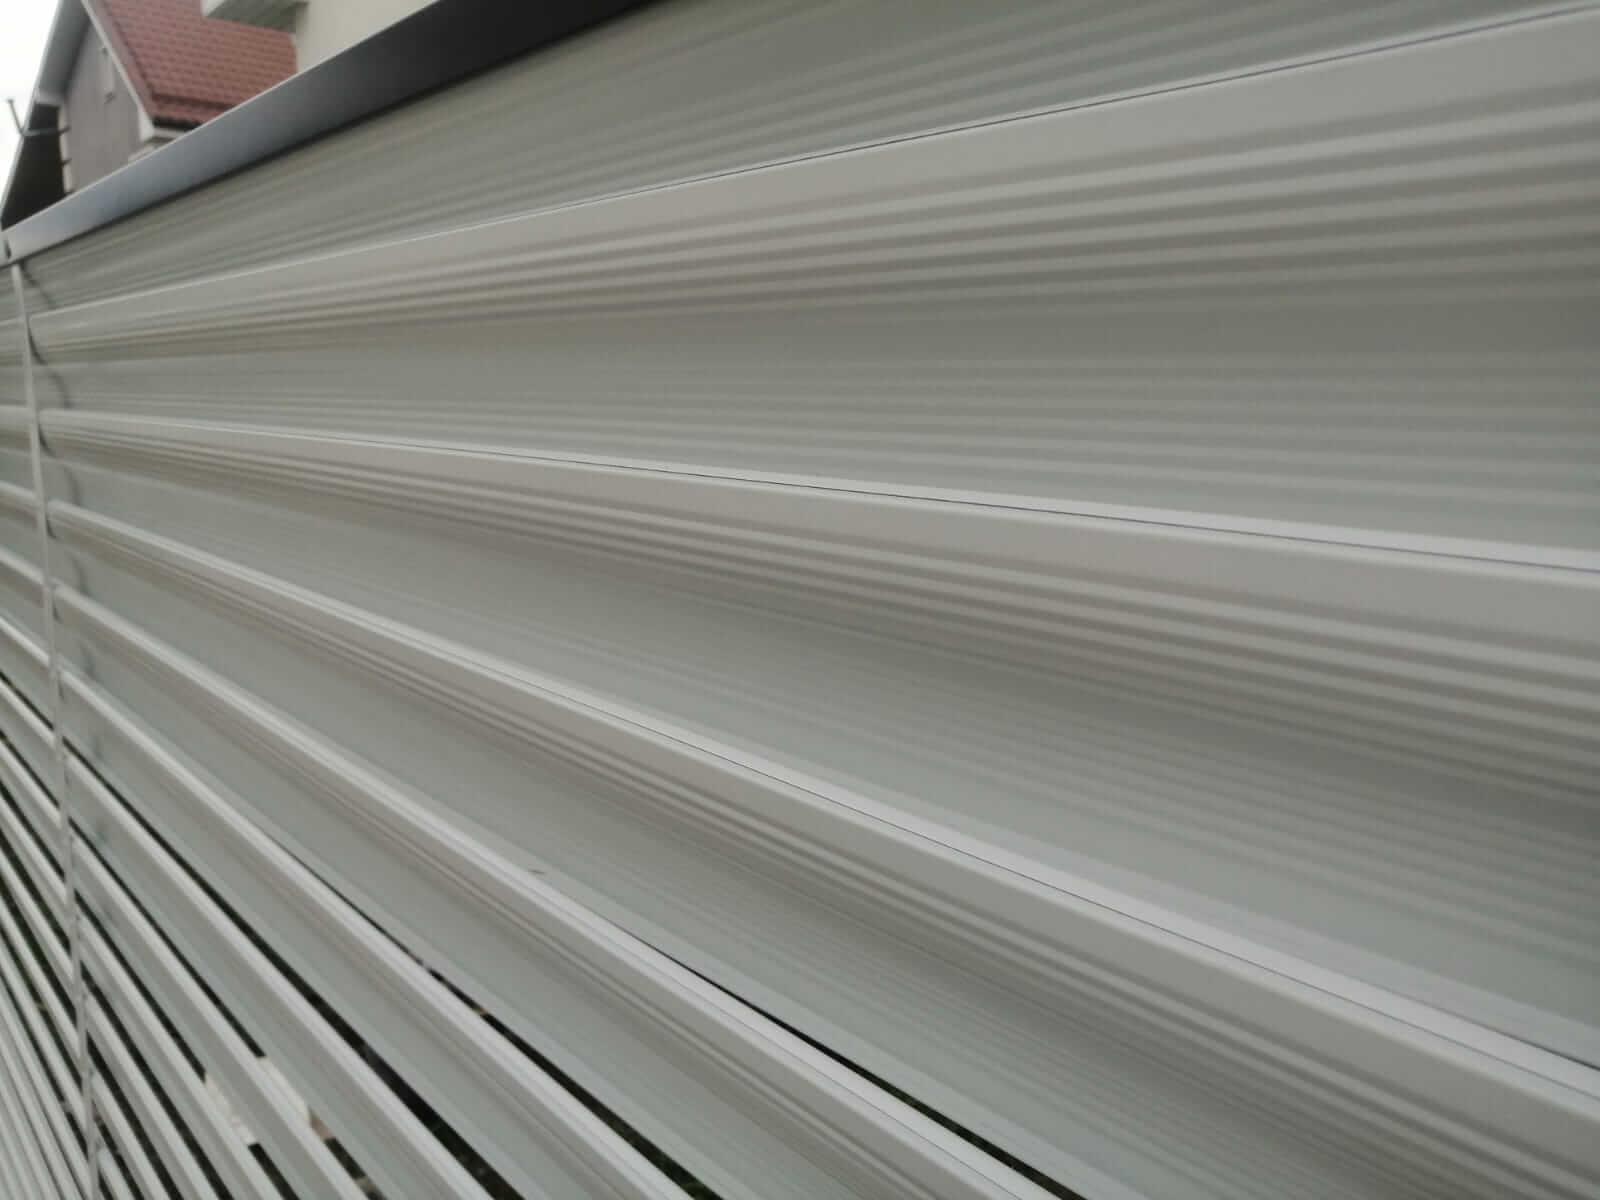 забор-жалюзи белый двухсторонний фото7